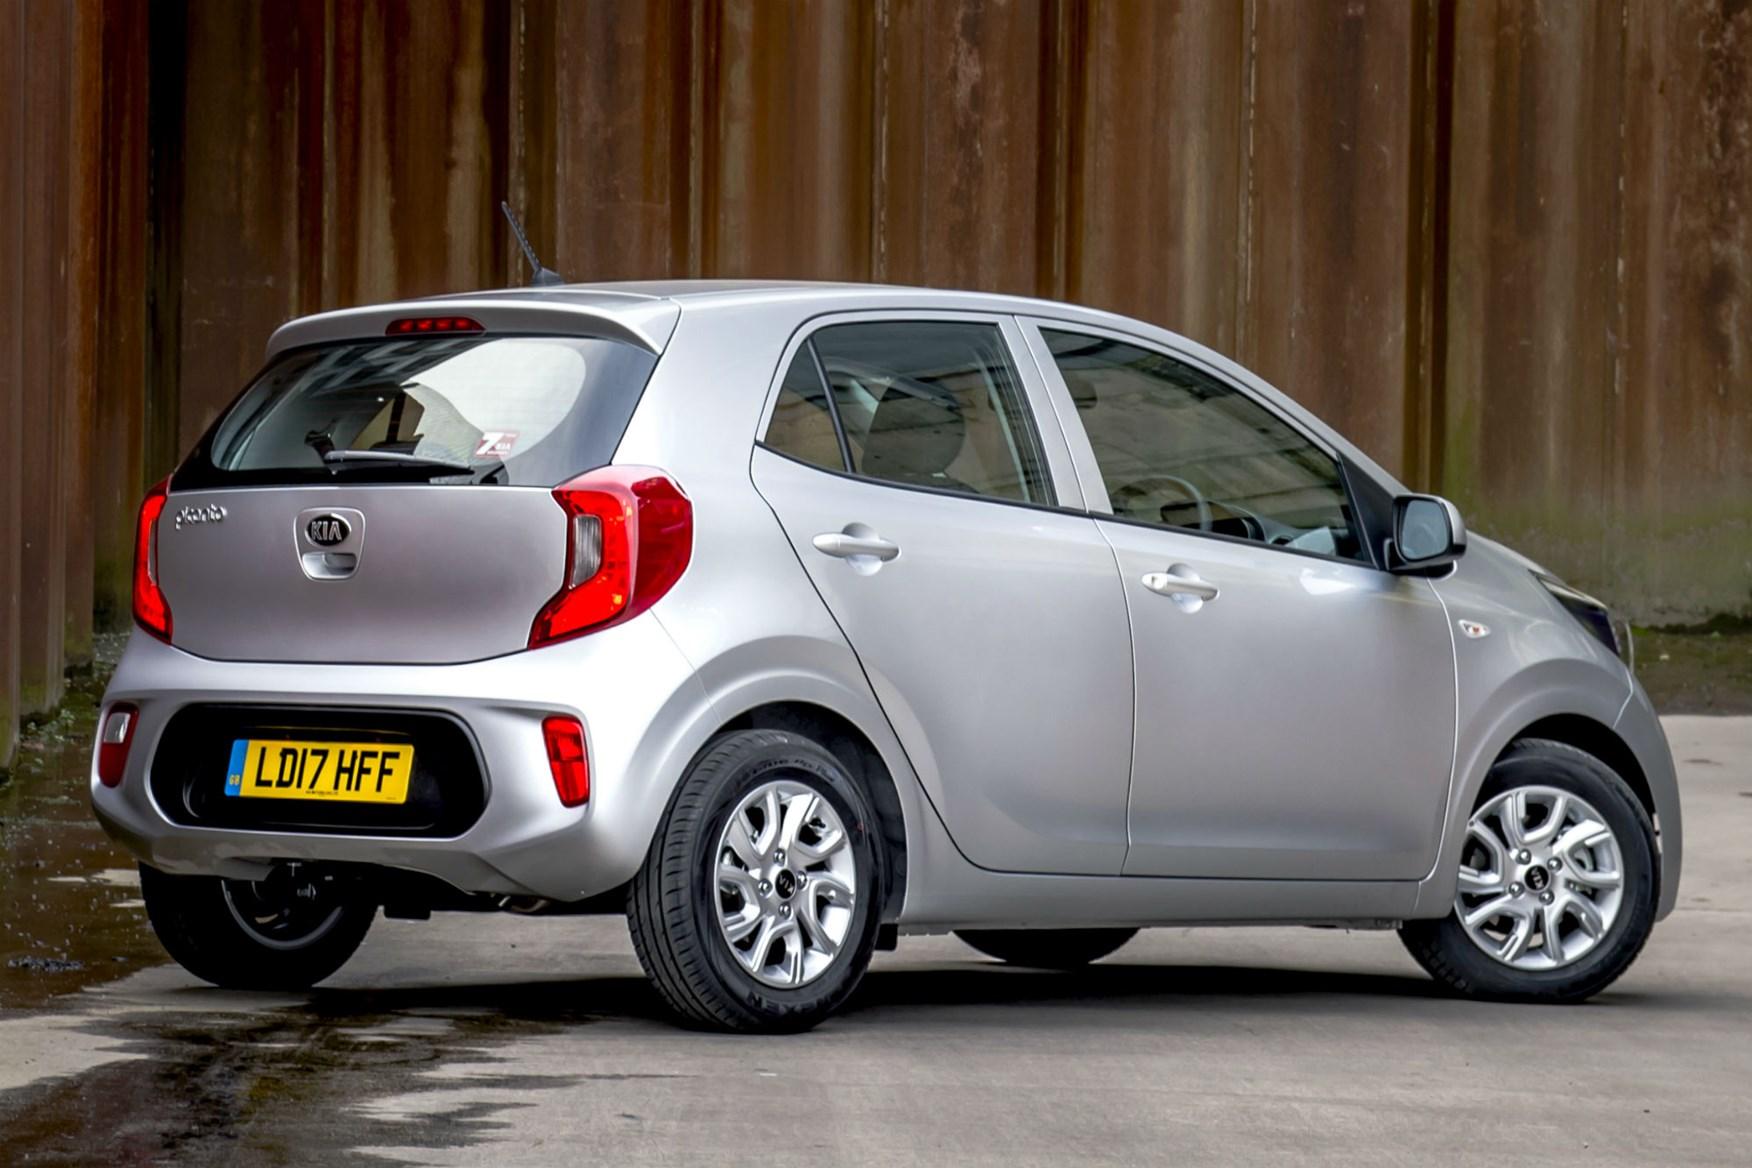 PCP finance best new car deals for under £100 per month